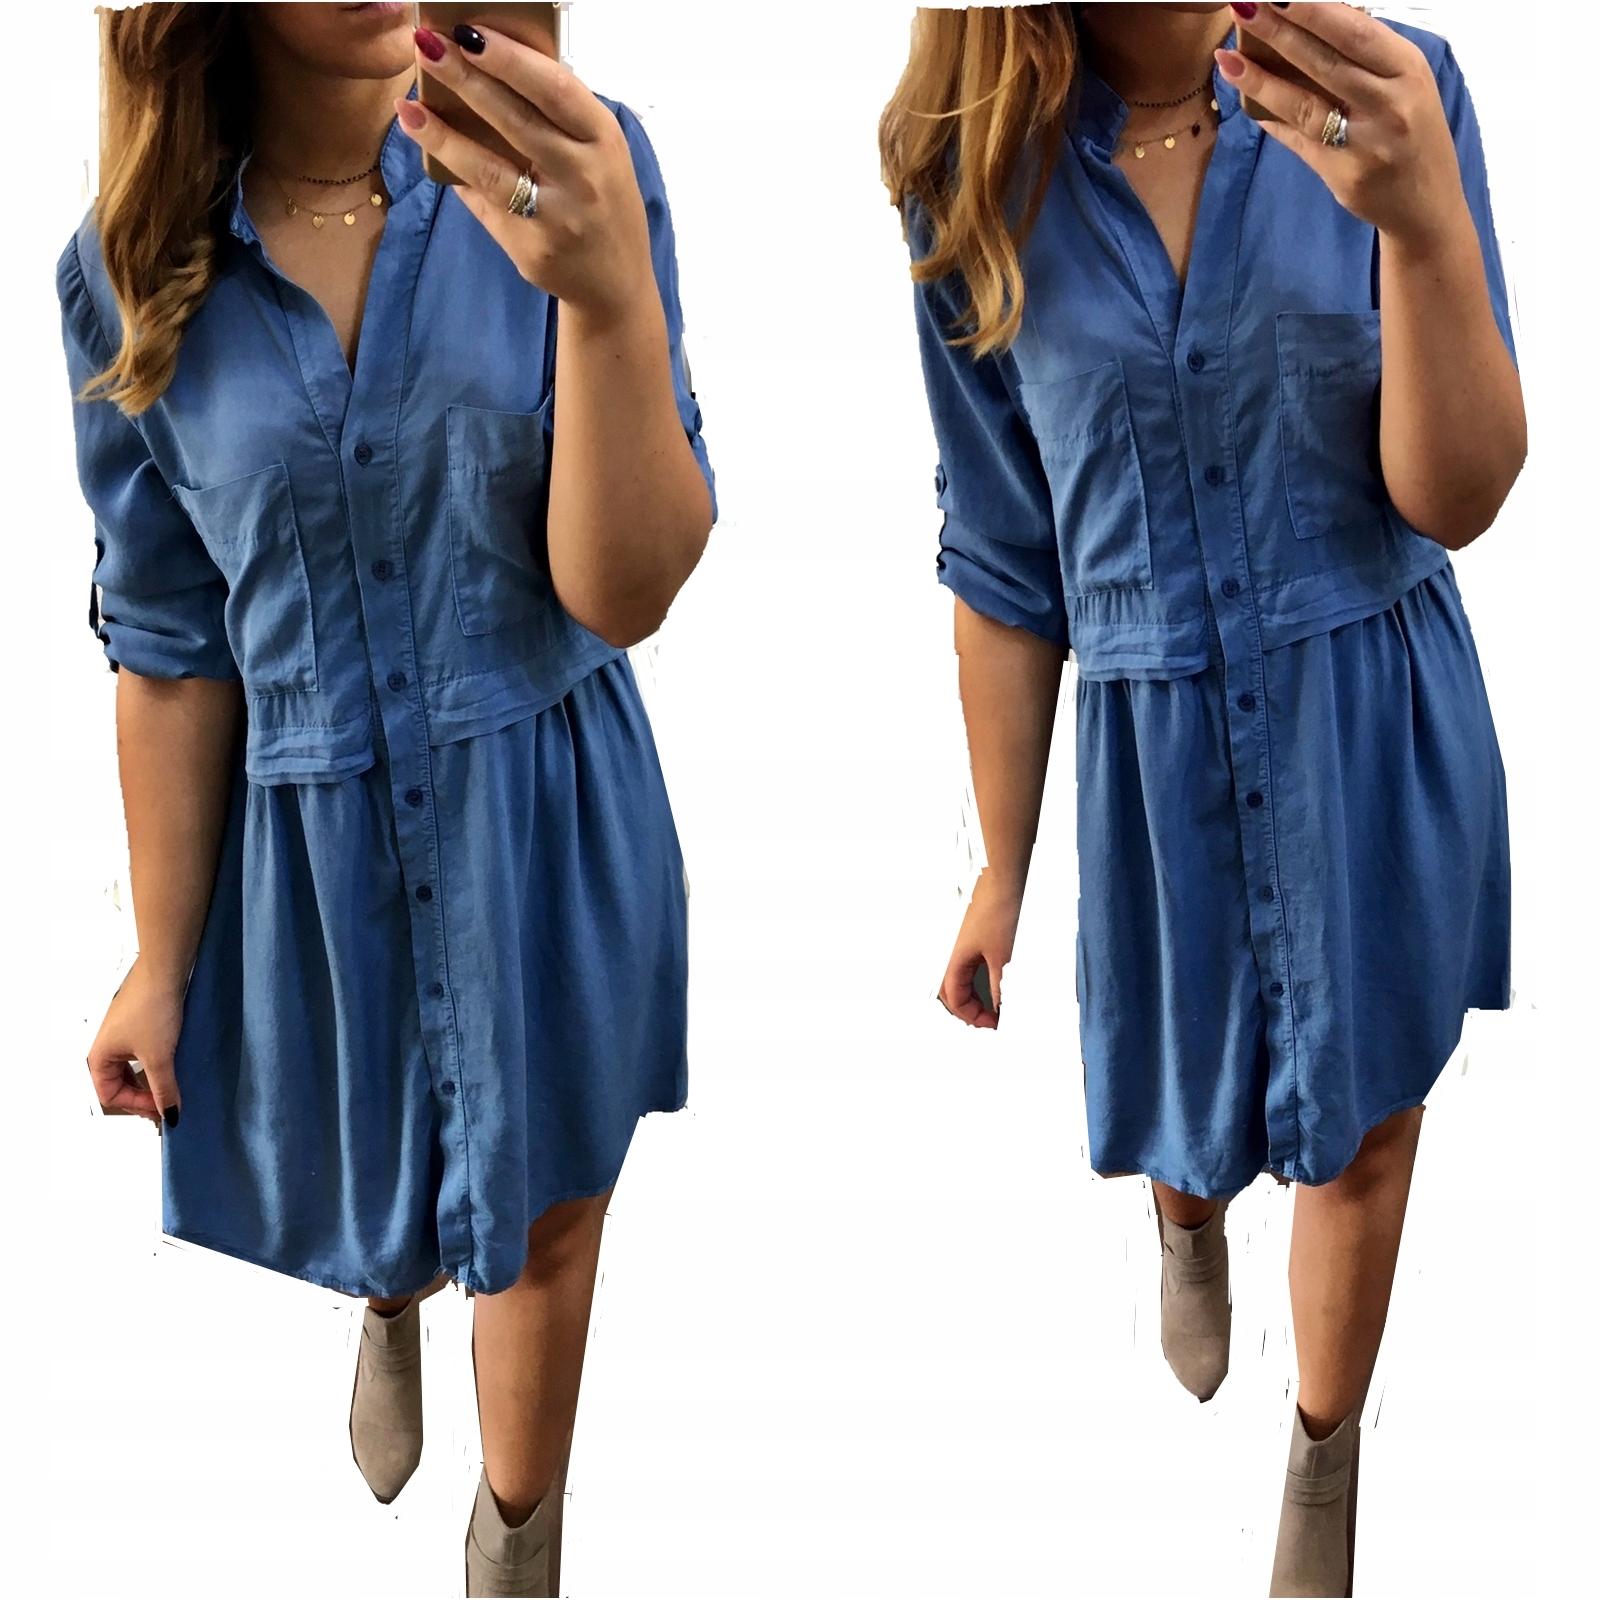 8286a8c5 Sukienka KOSZULOWA Jeans Oversize L XL JEANSOWA - 7679226573 ...